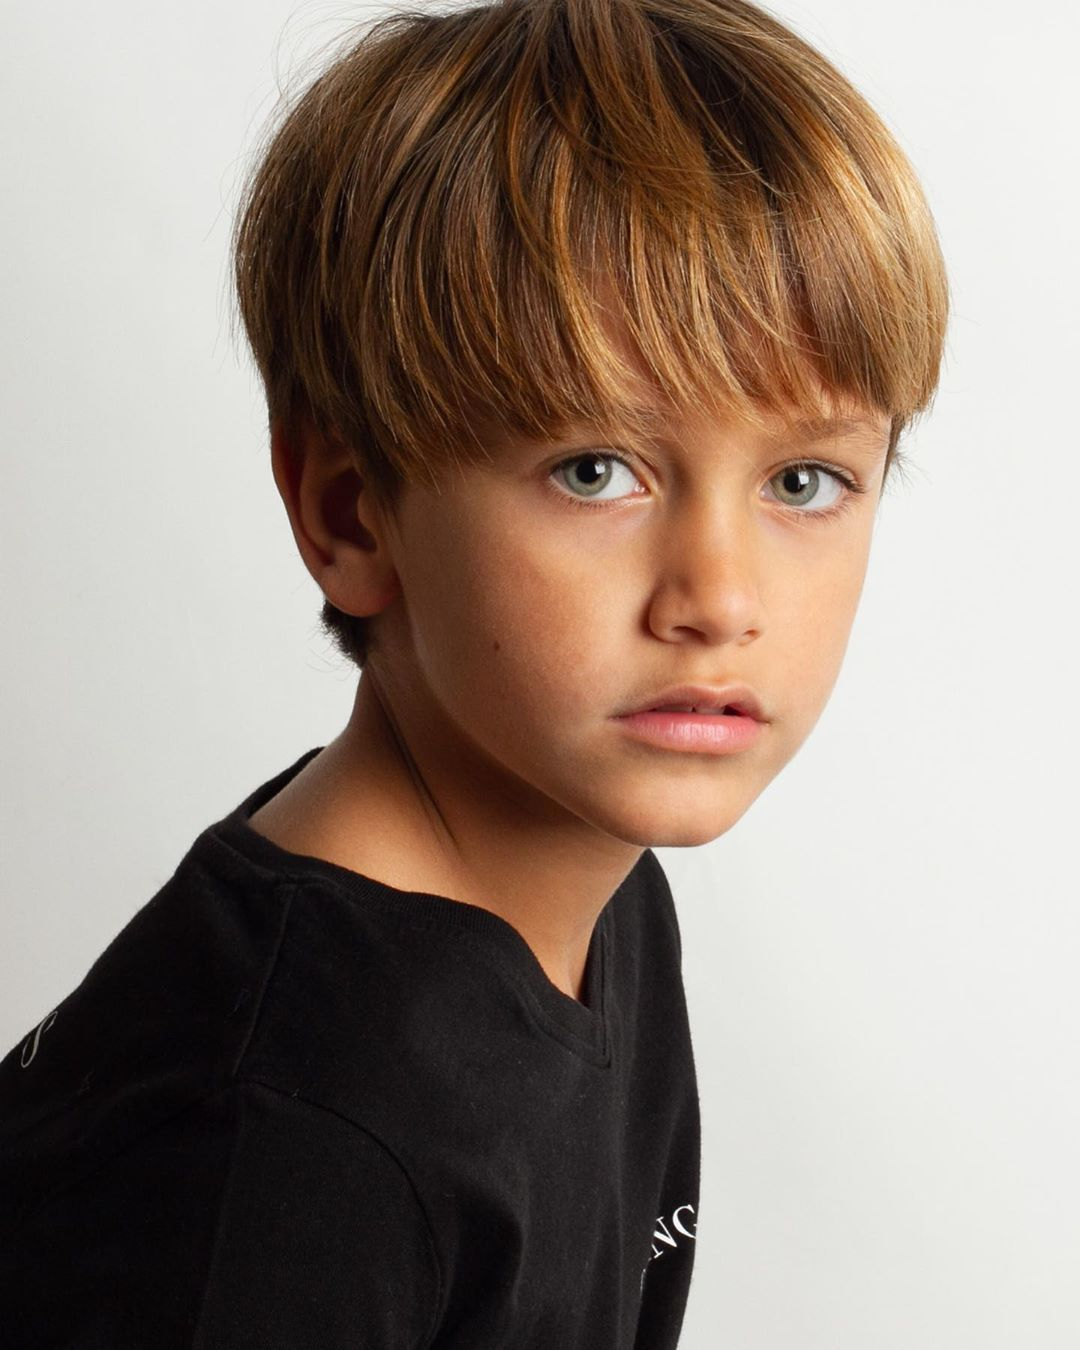 13 Vind Ik Leuks 0 Reacties Pacifico Pacifico Model Op Instagram Pacifico Pacificomodel Cas Boy Hairstyles Young Boy Haircuts Kids Hairstyles